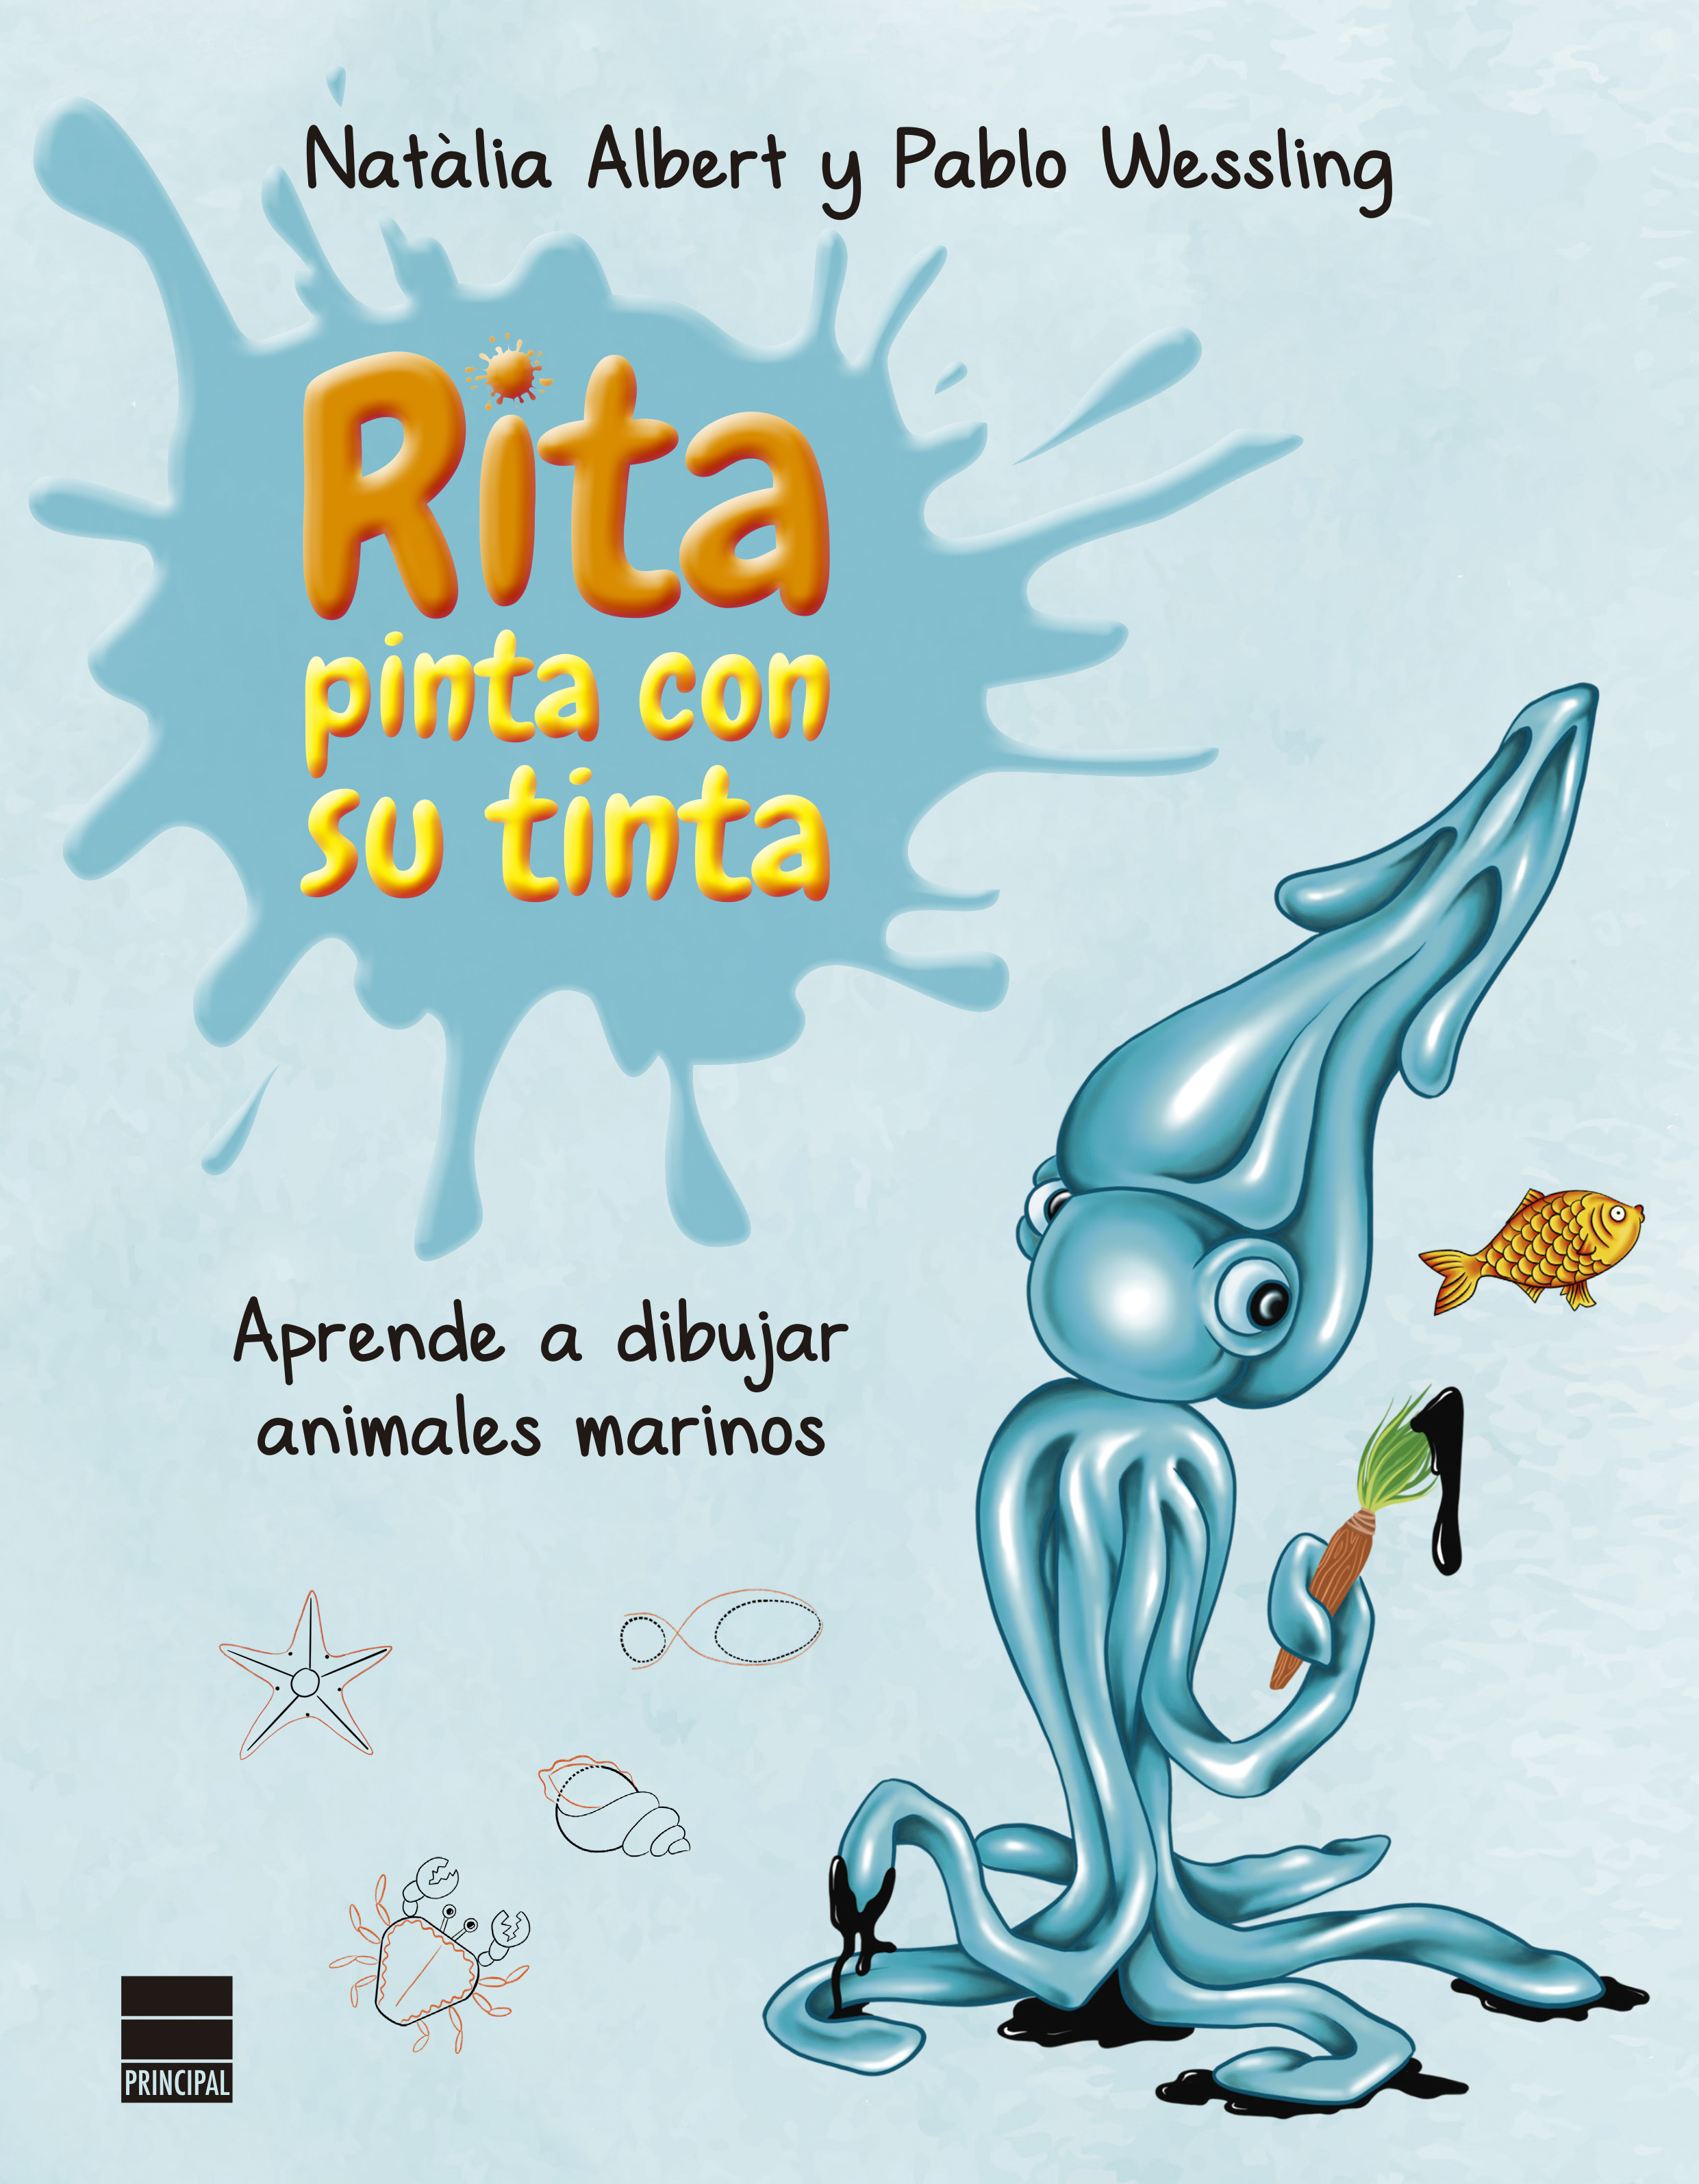 Rita pinta con su tinta   «Aprende a dibujar animales marinos»